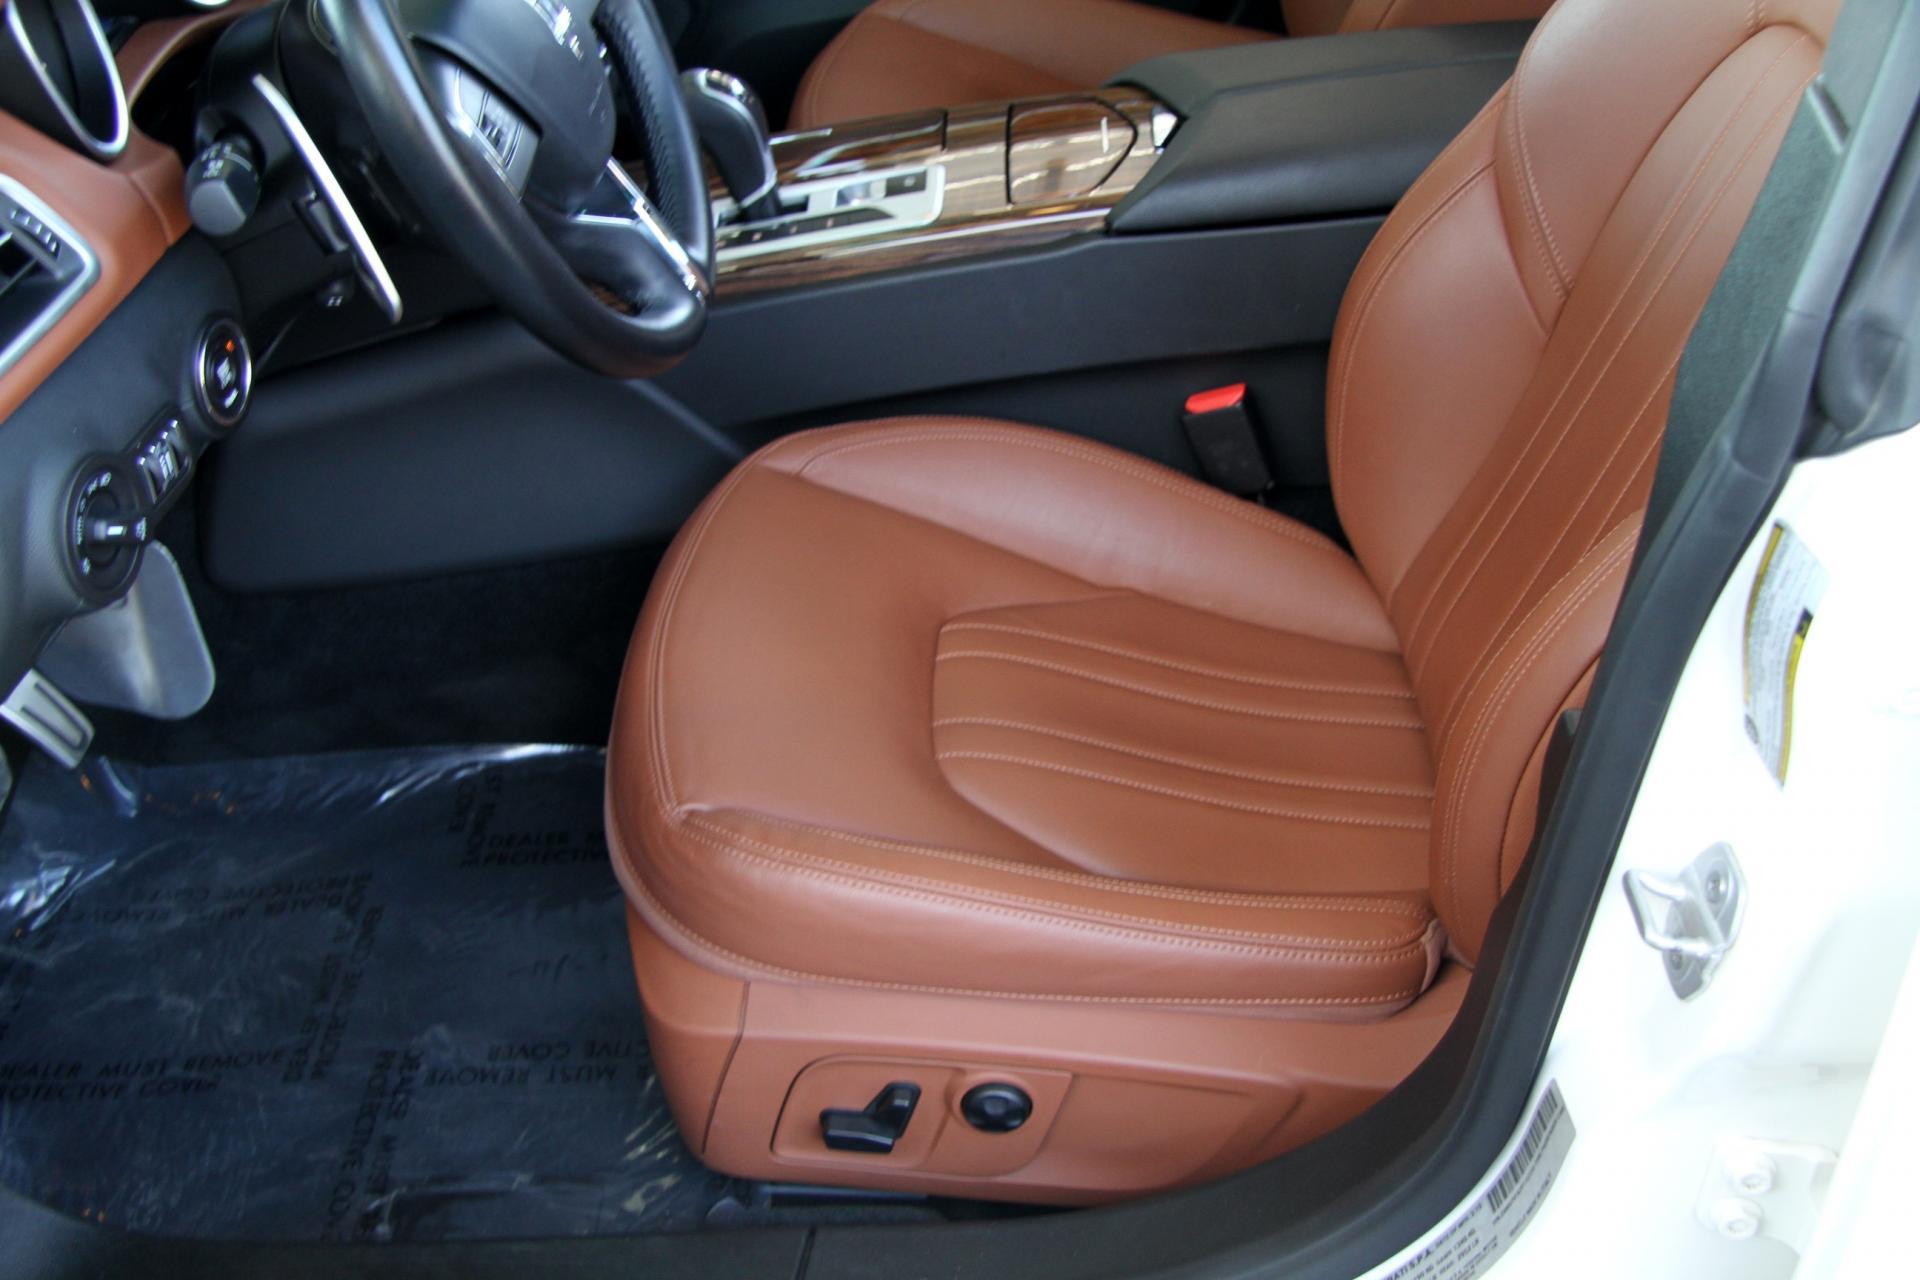 2015 Maserati Ghibli S Q4 Stock 5995 For Sale Near